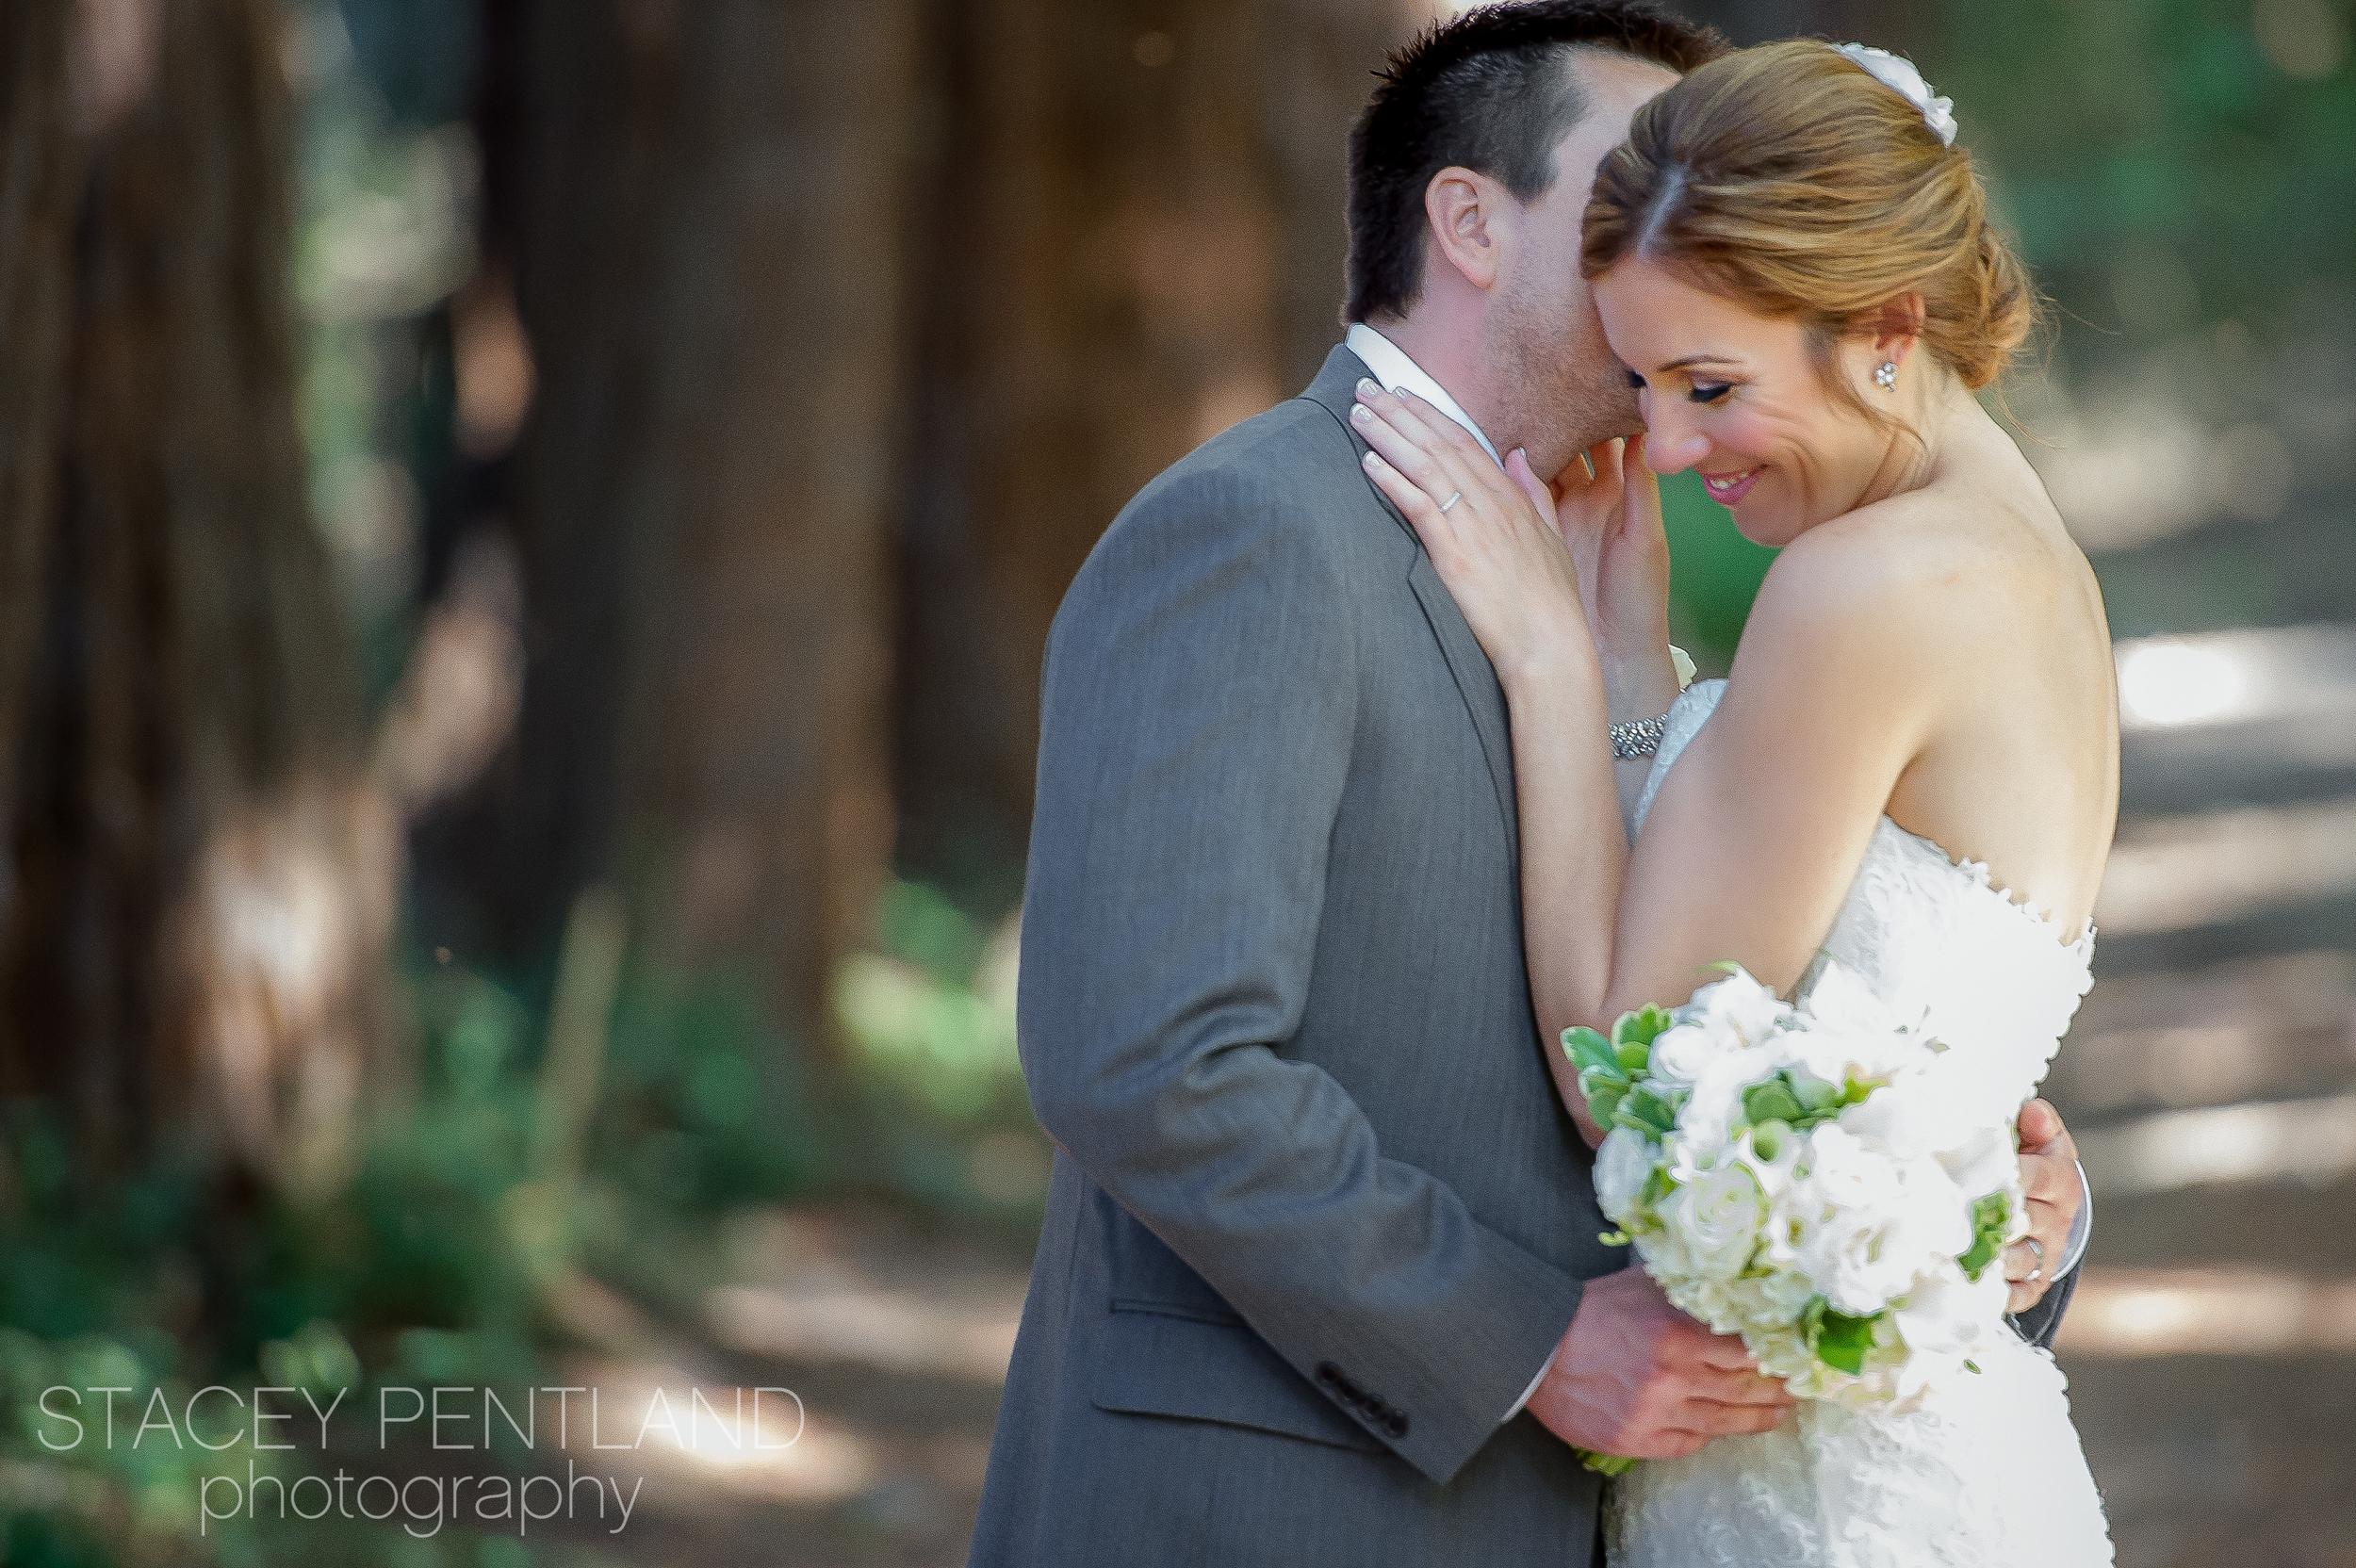 camille+jeff_wedding_spp_001.jpg